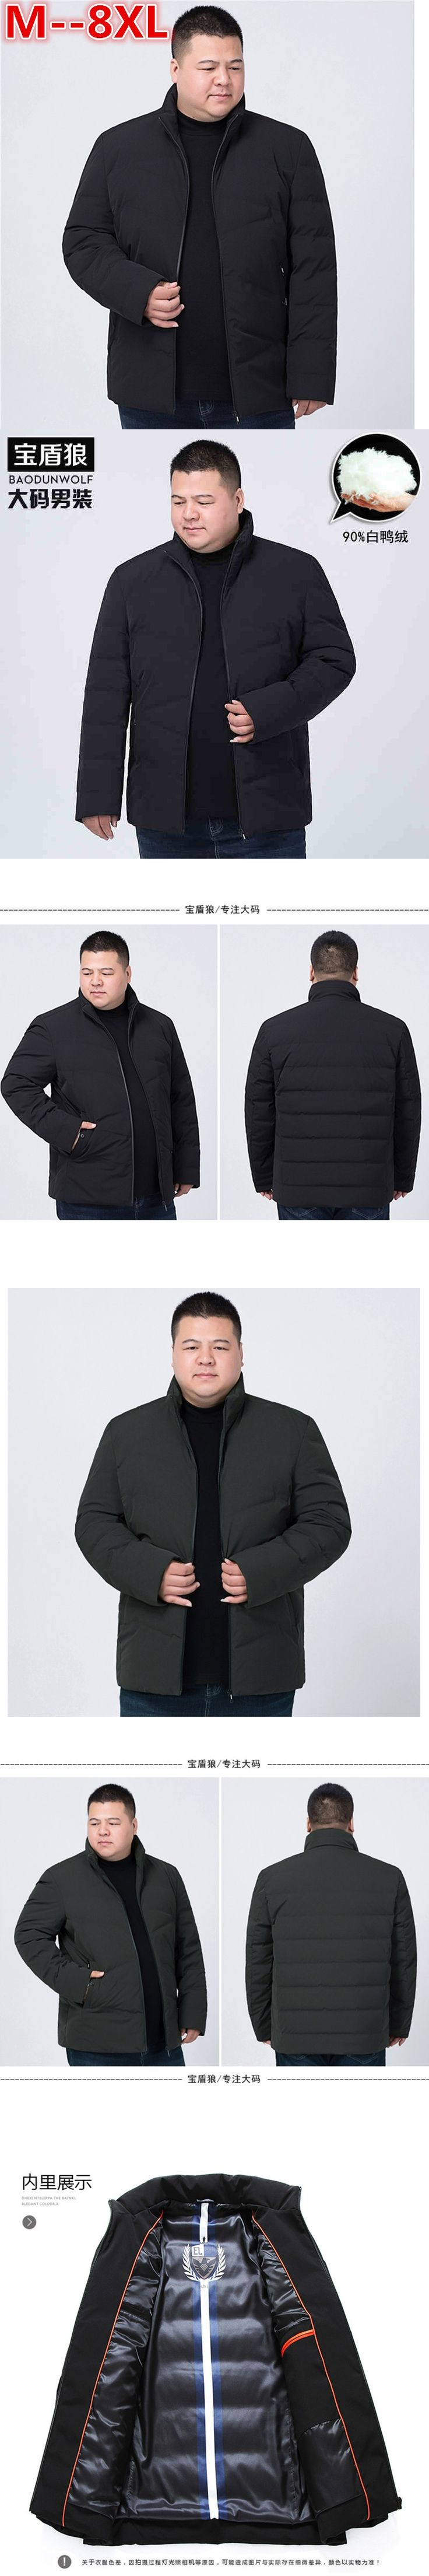 PLus size 10XL 8XL 6XL 5XL 2017 Hot Sale Men Winter Splicing Cotton-Padded Coat Jacket Winter Parkas High Quality large big size